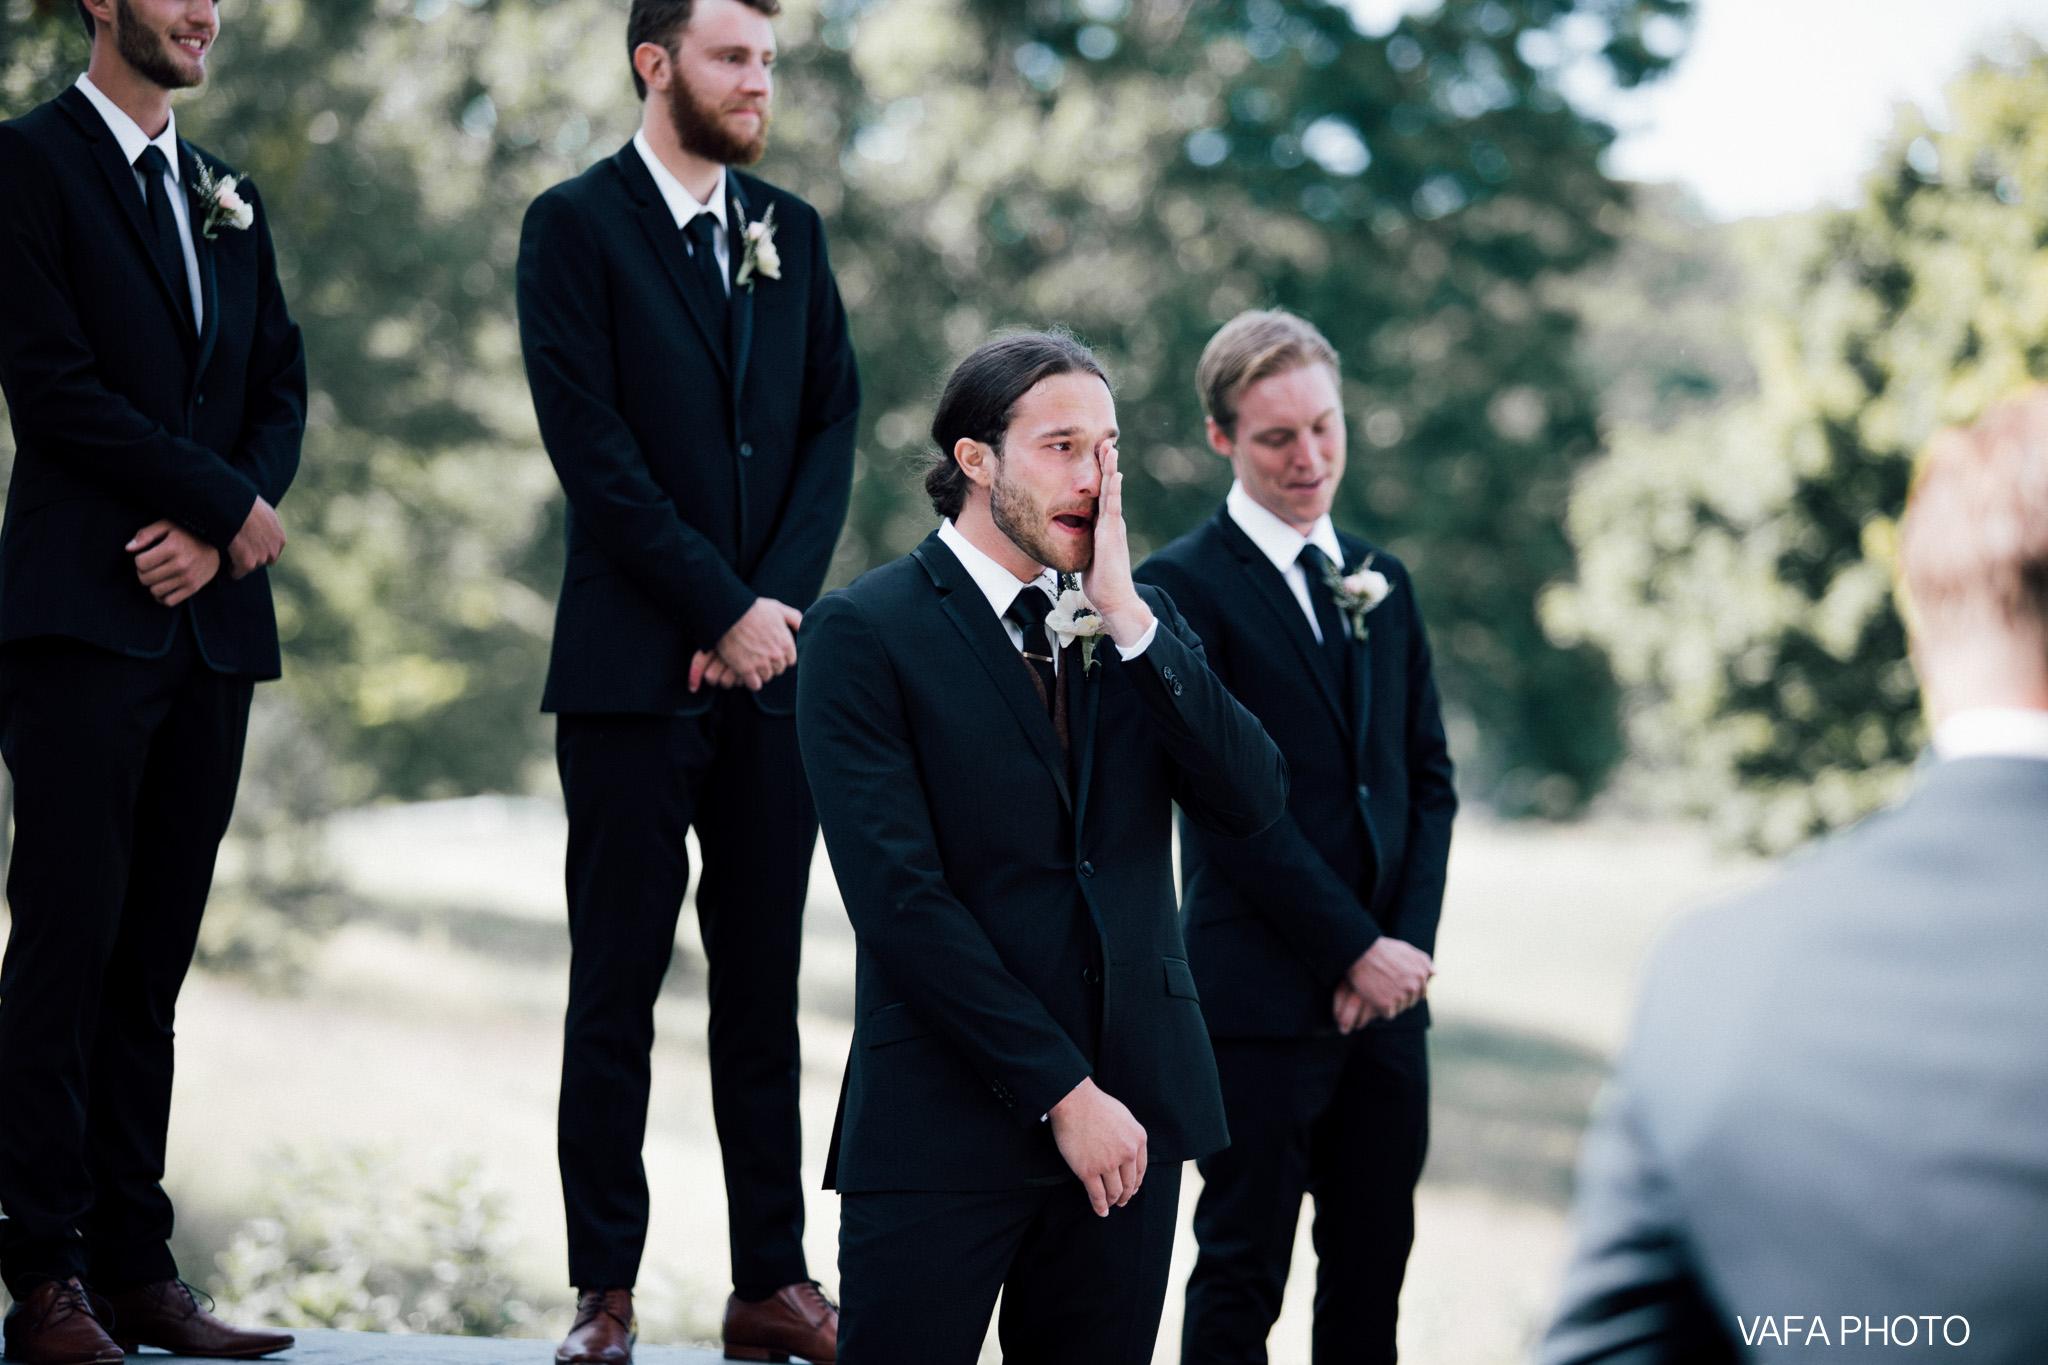 The-Felt-Estate-Wedding-Kailie-David-Vafa-Photo-311.jpg